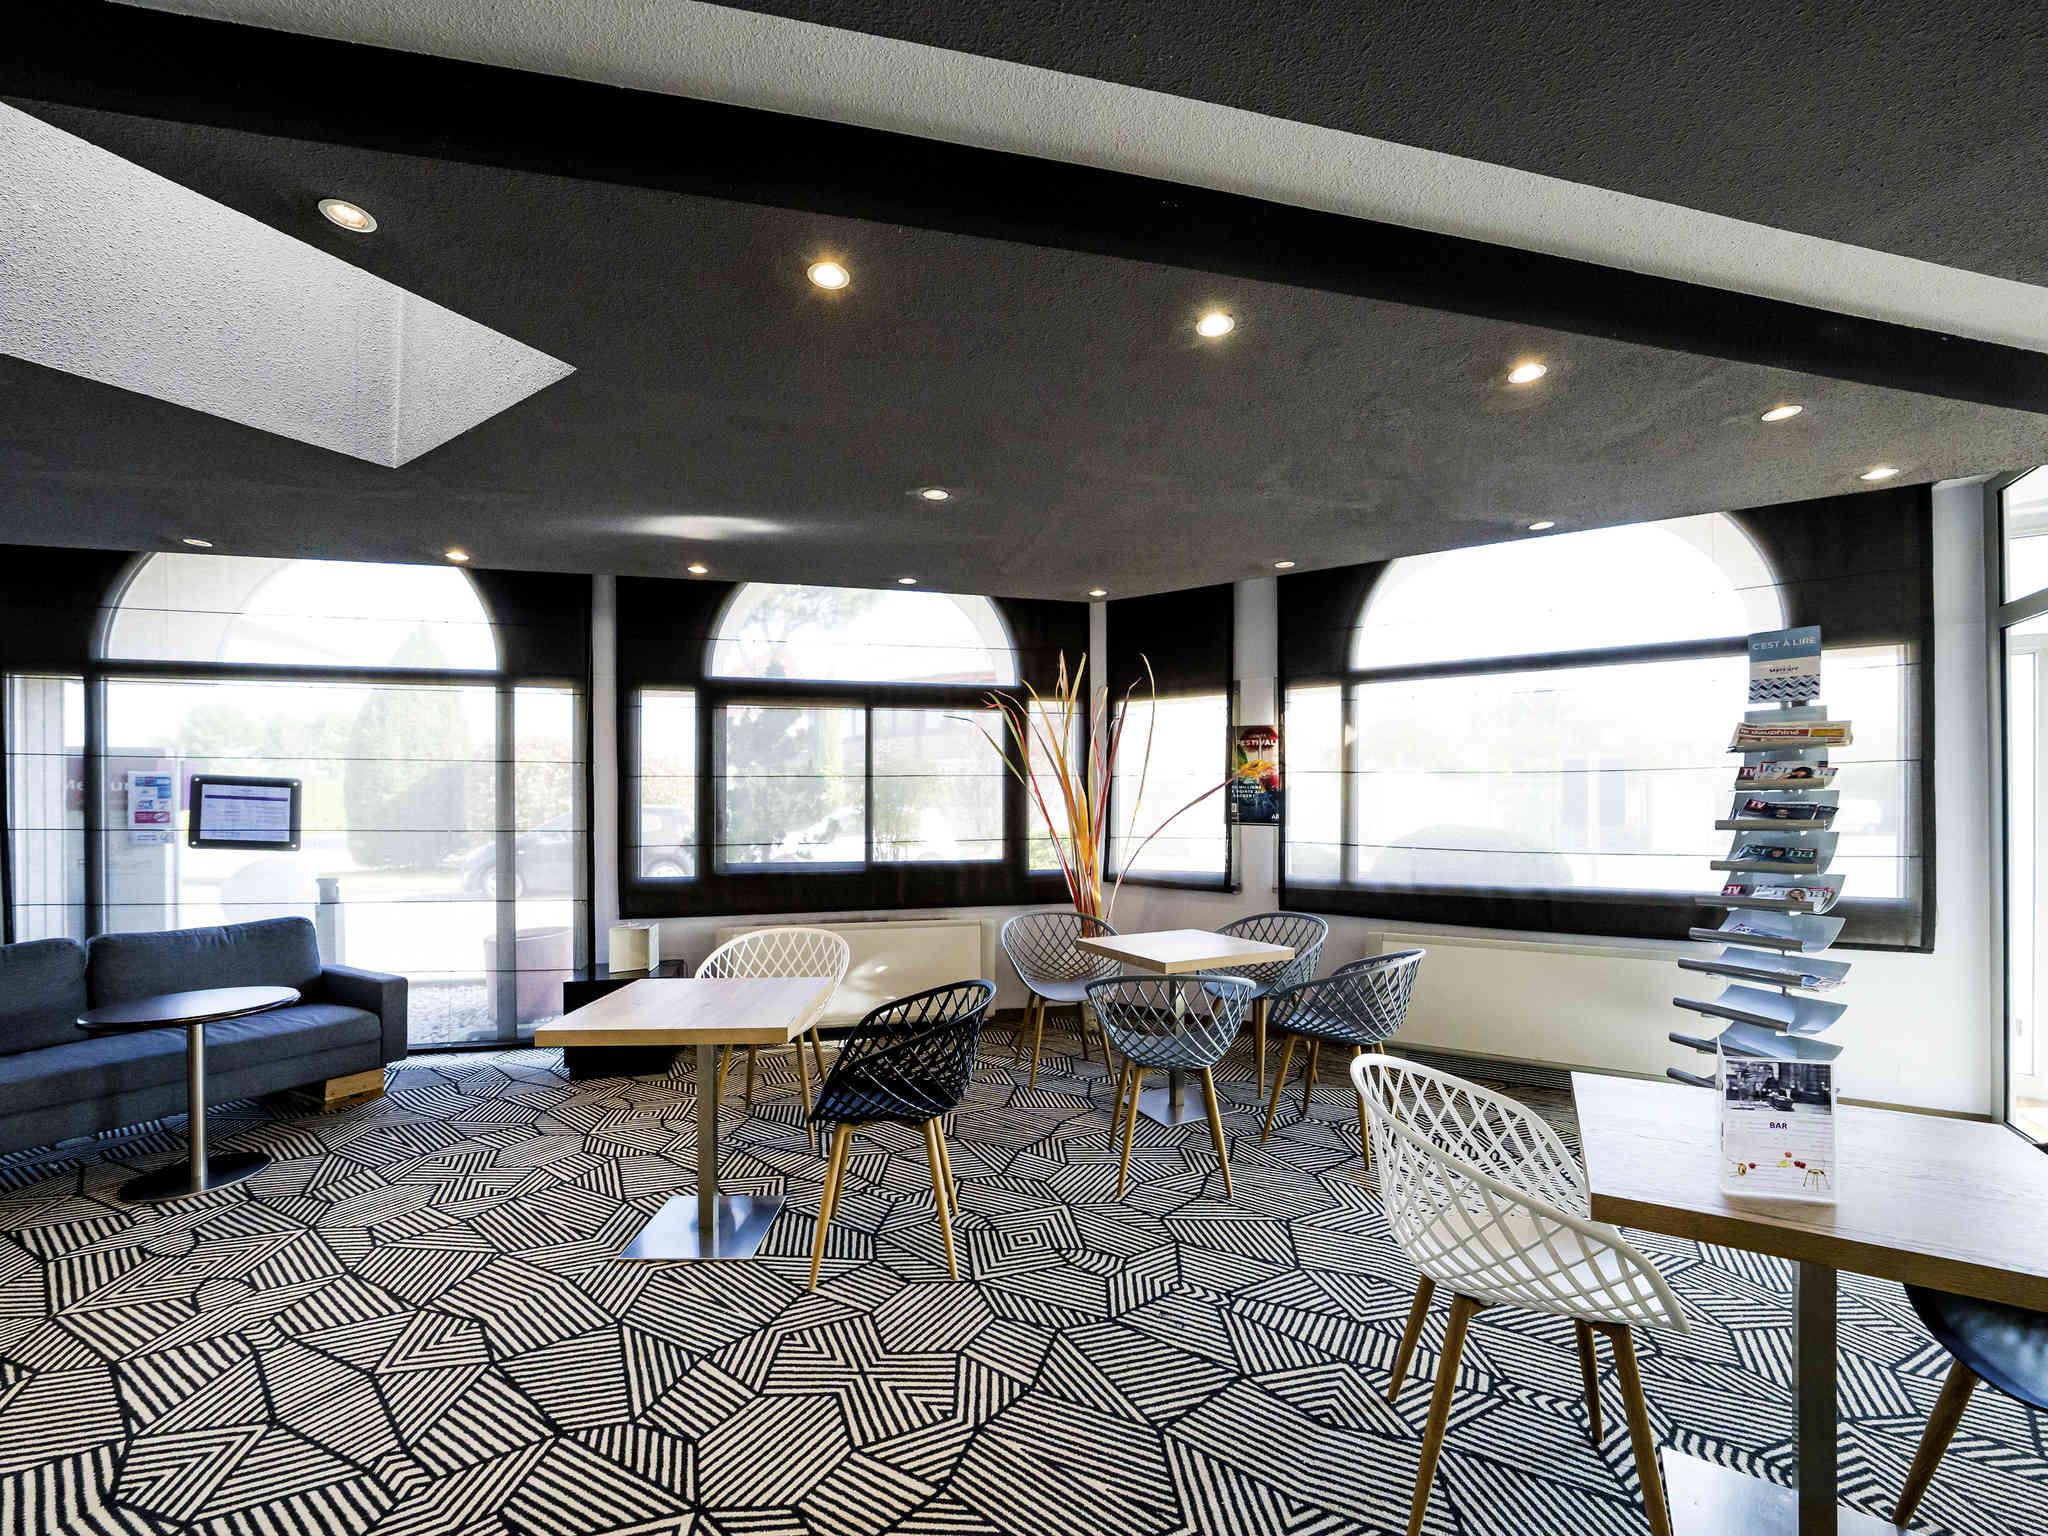 Hotel a chanas albergo mercure vienne sud chanas - Decor discount montelimar ...